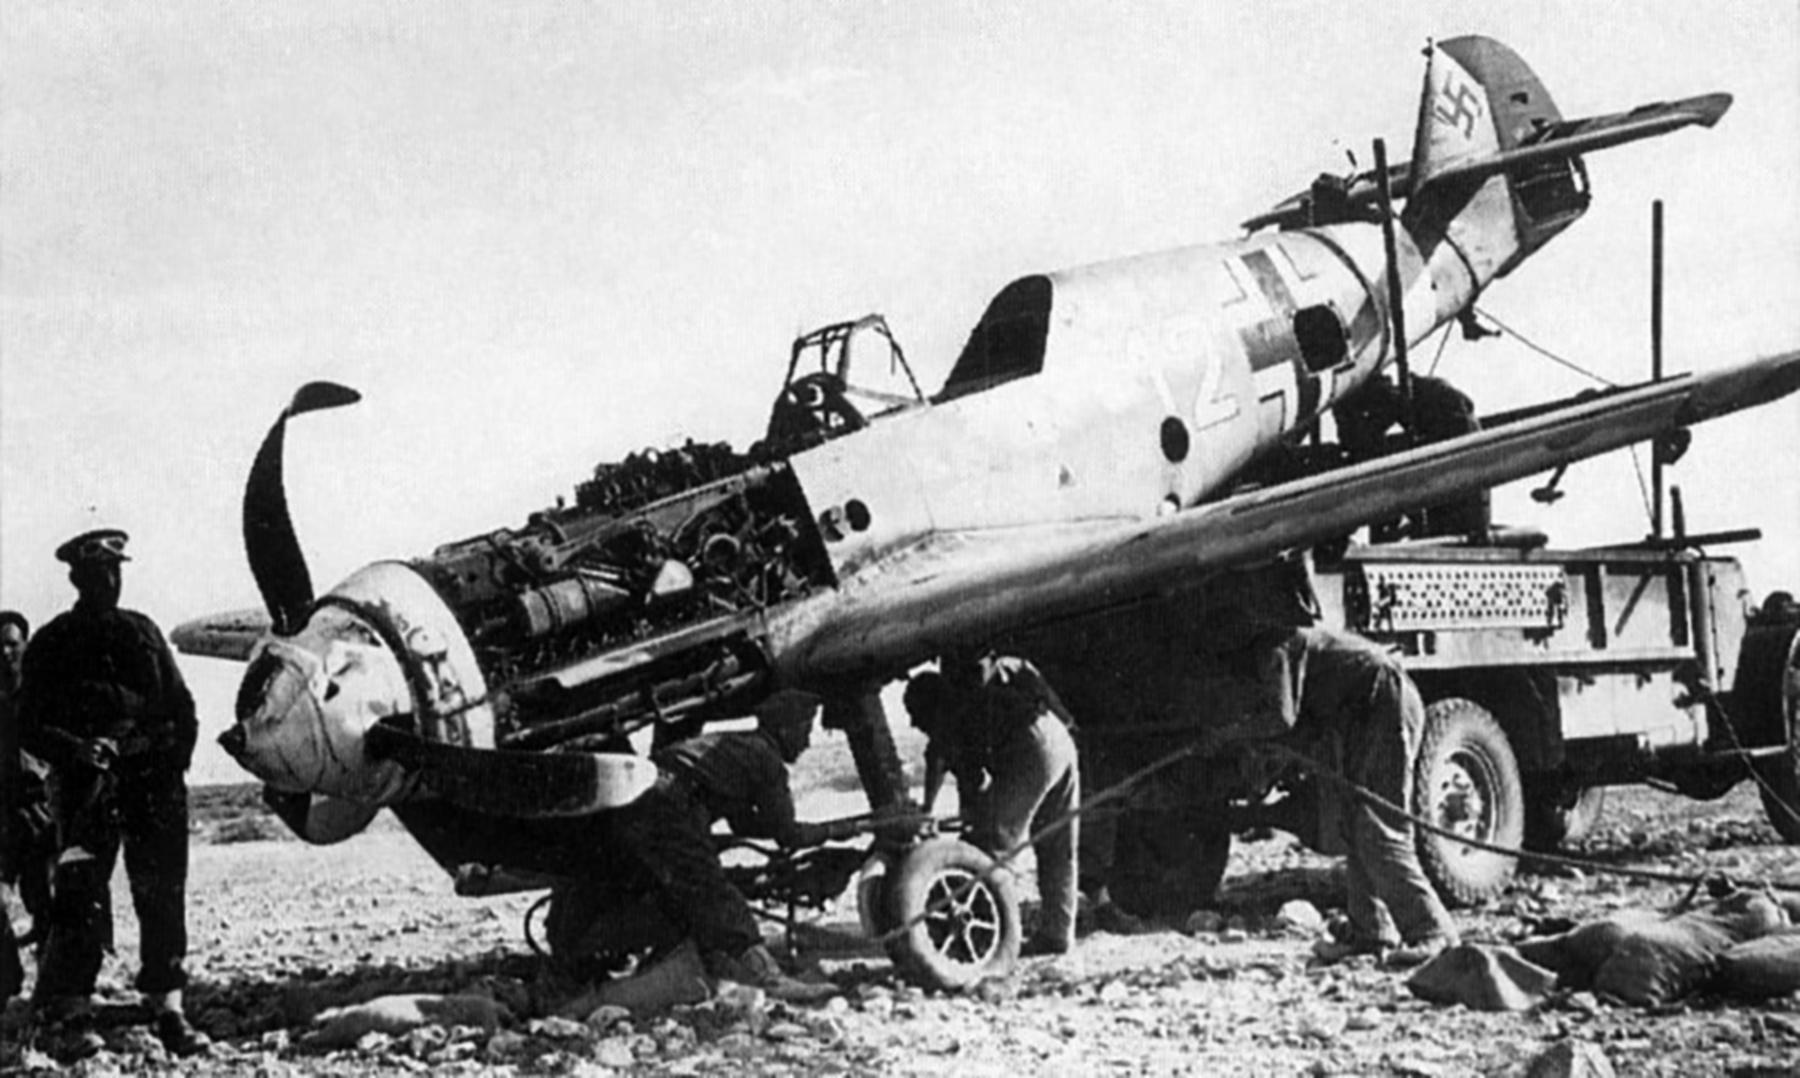 Messerschmitt Bf 109F4Trop 1.JG27 White 12 being salvaged 1941 01